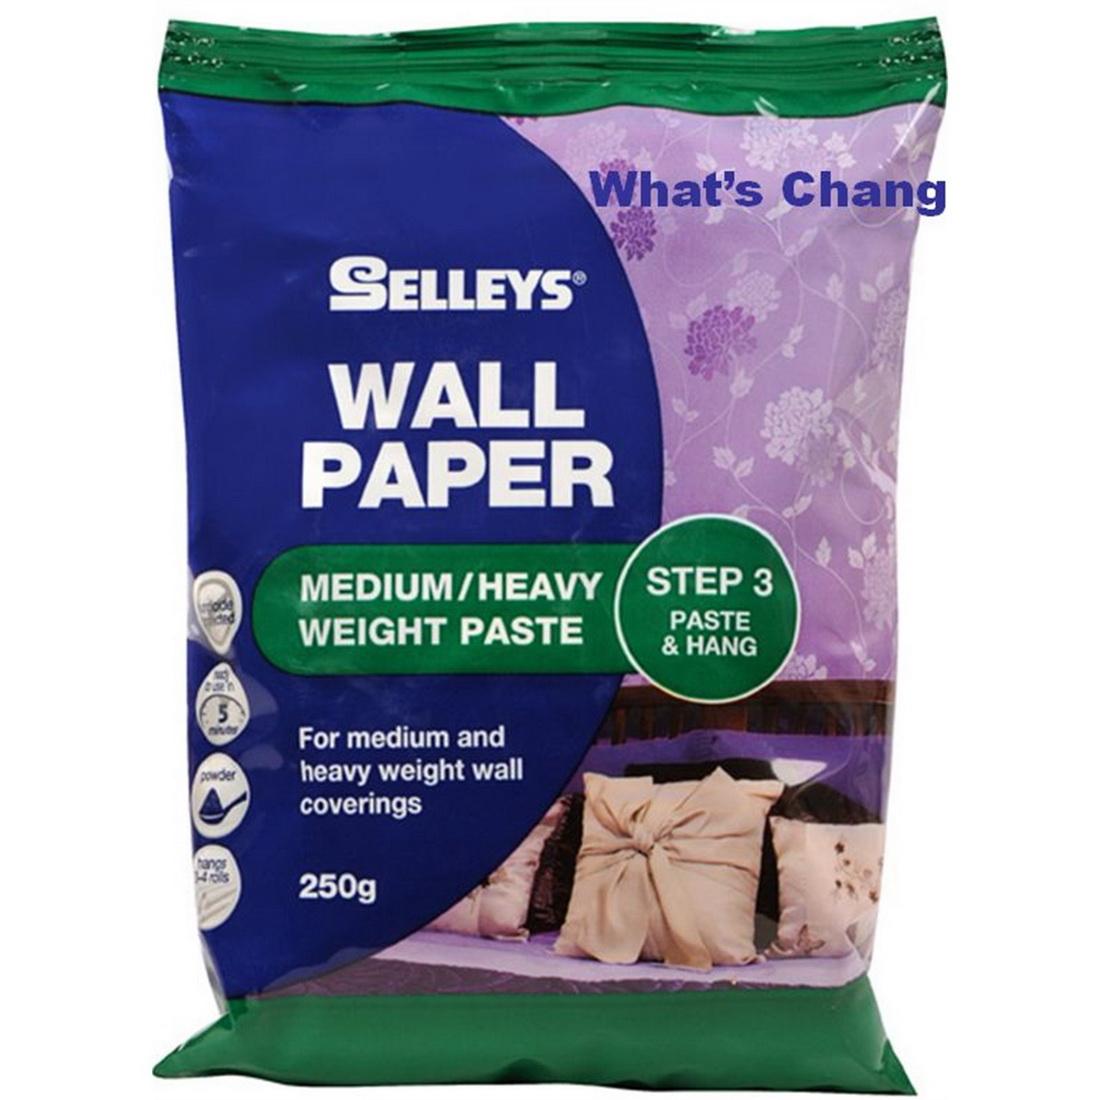 250g Medium/Heavy Weight Wall Paper Paste